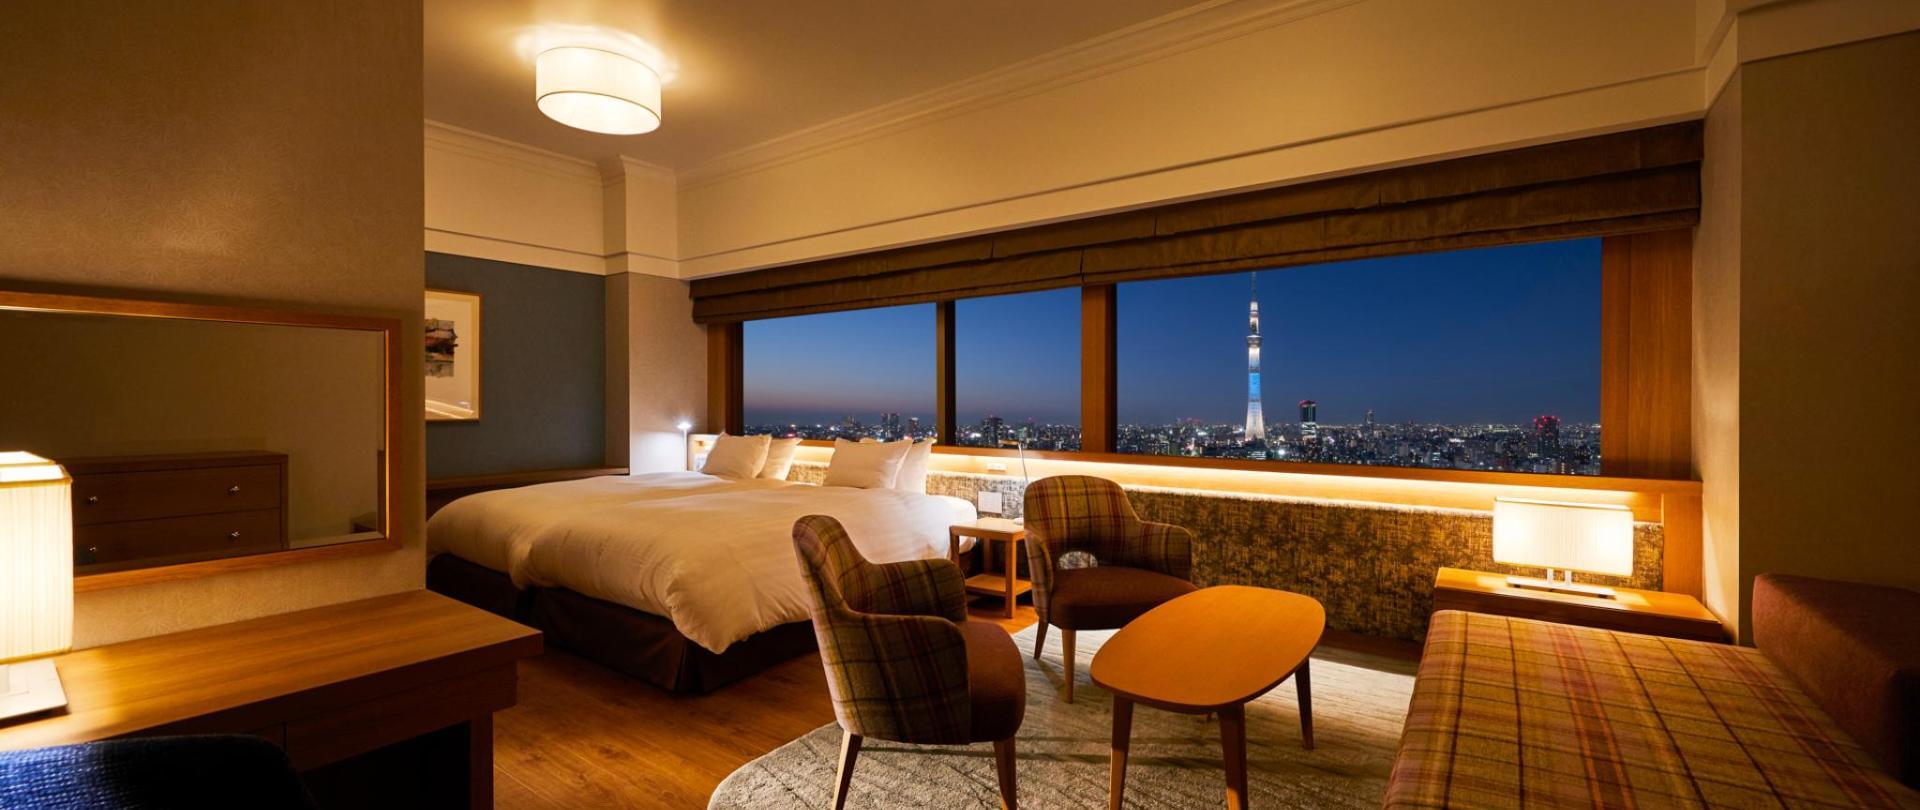 room2301_0241web.jpg